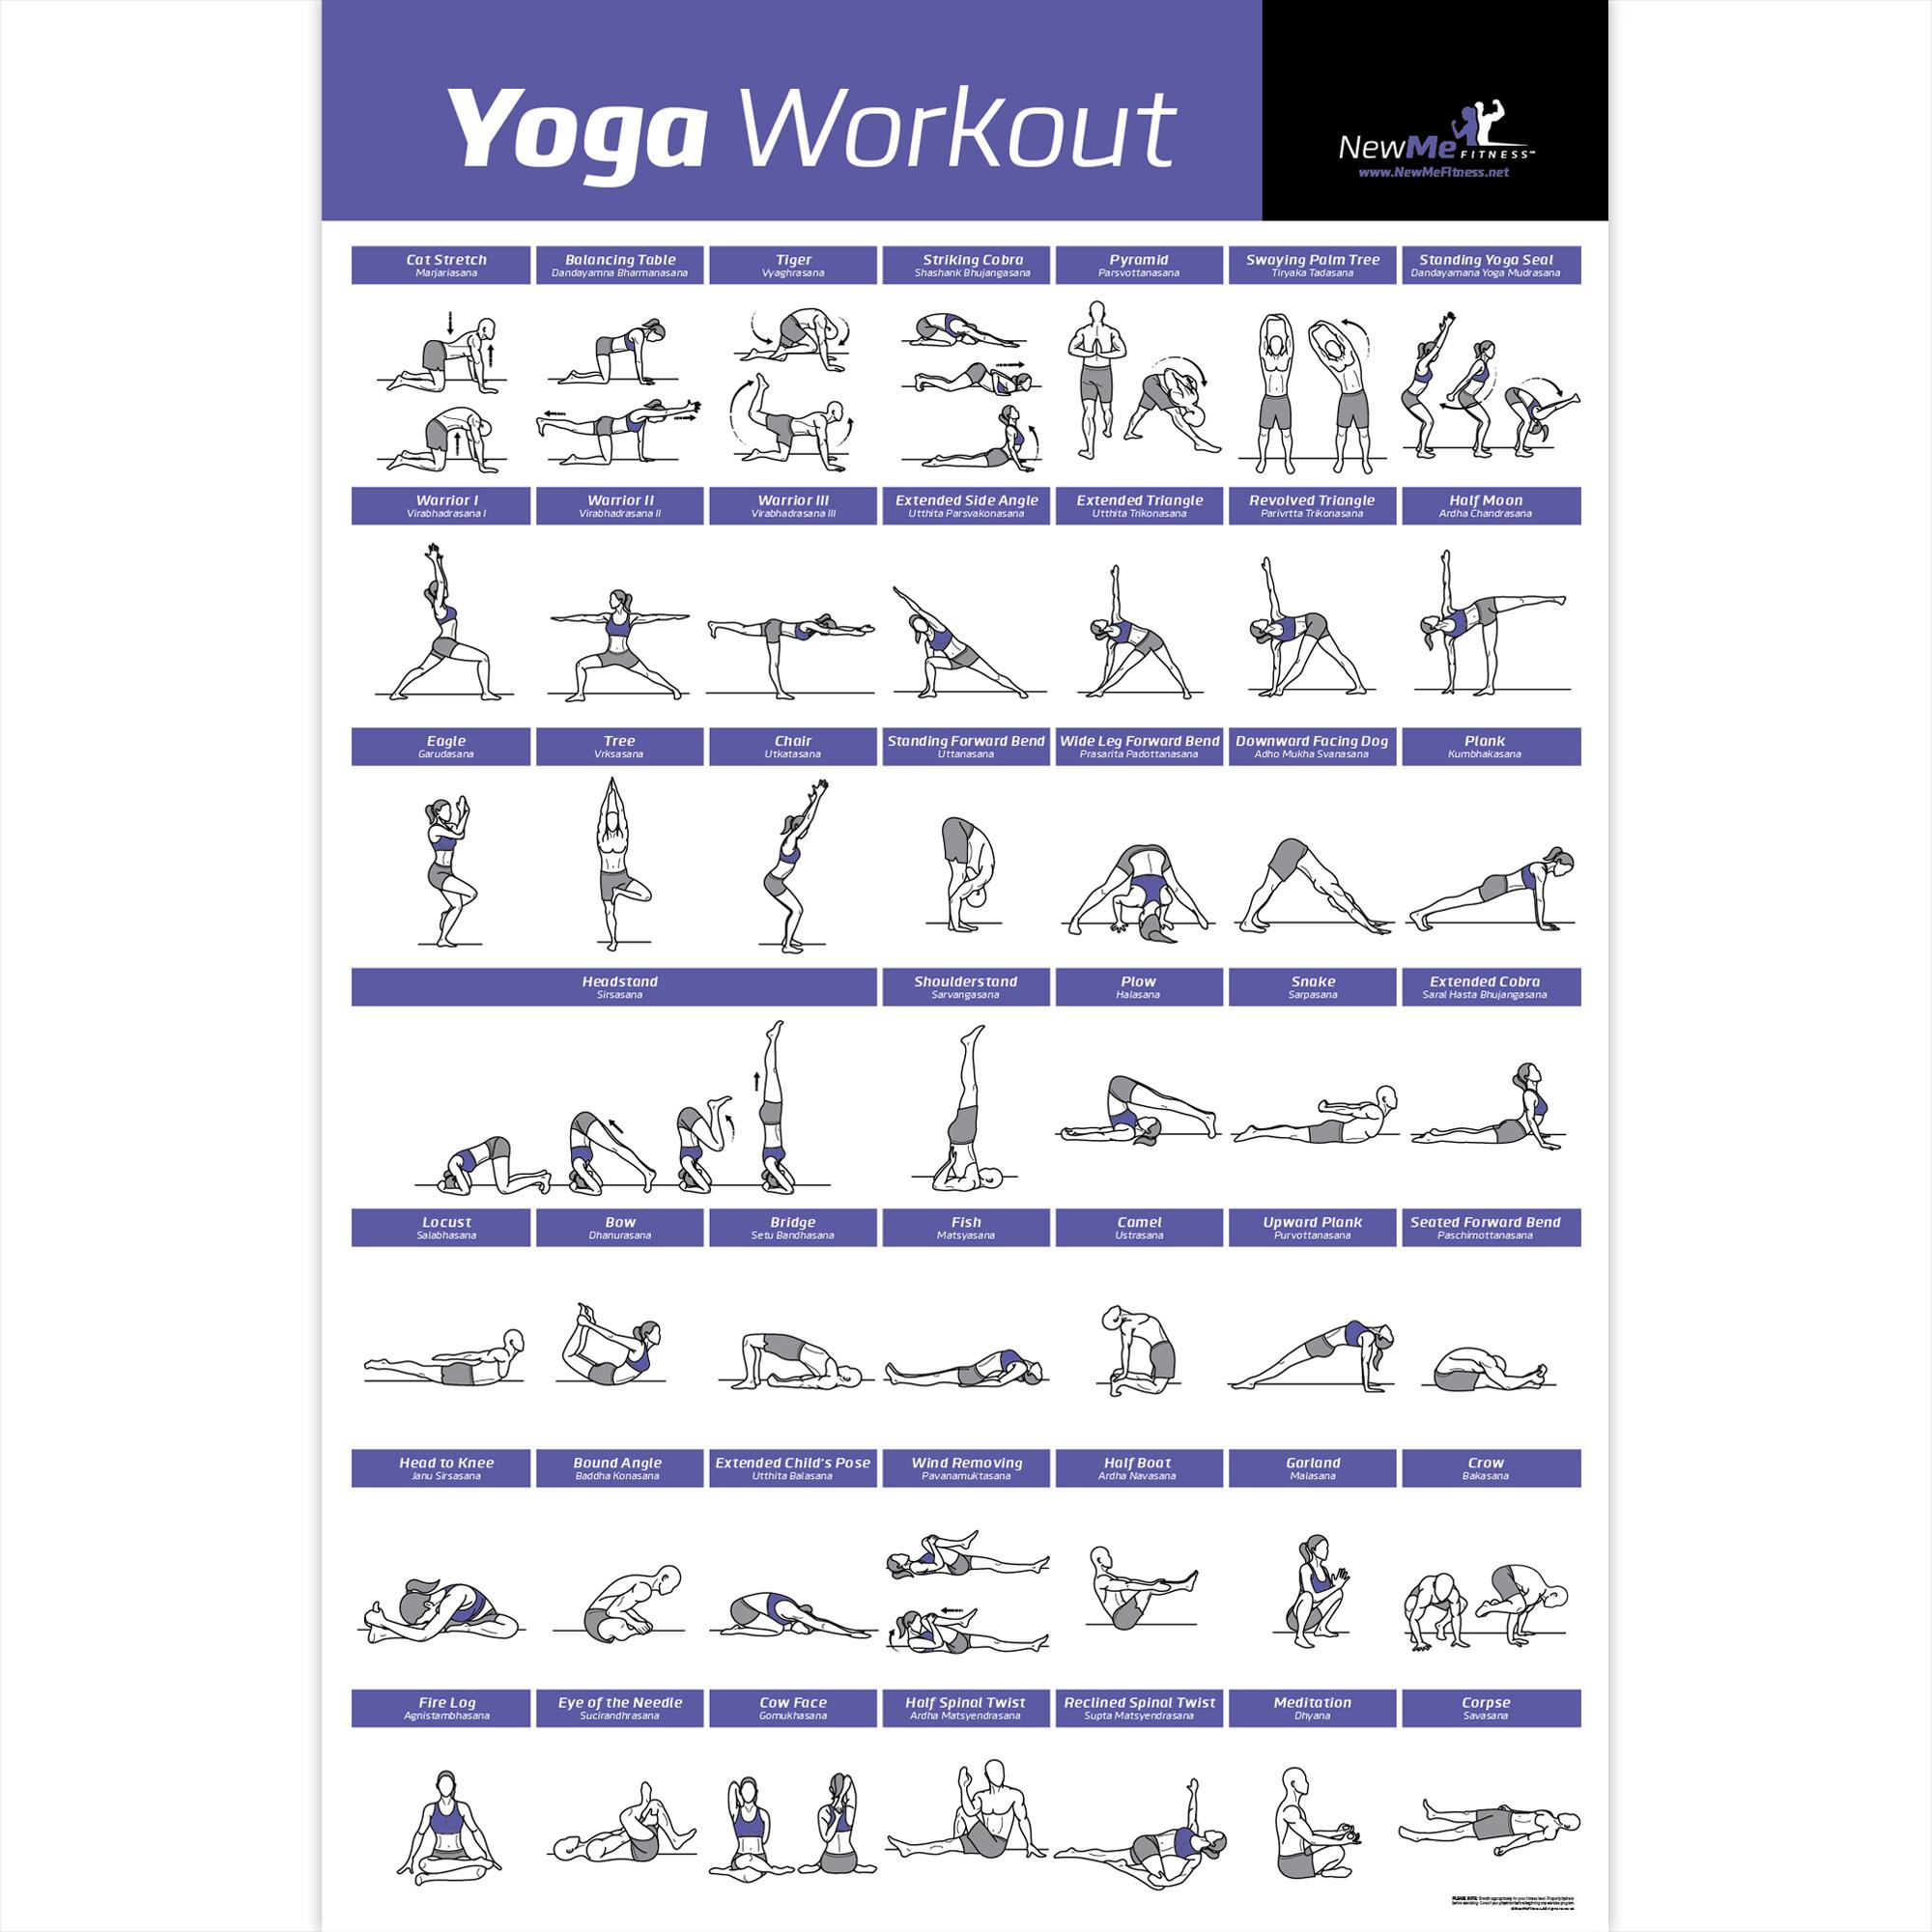 NewMe Fitness Premieres New Yoga Workout Poster on Amazon ...